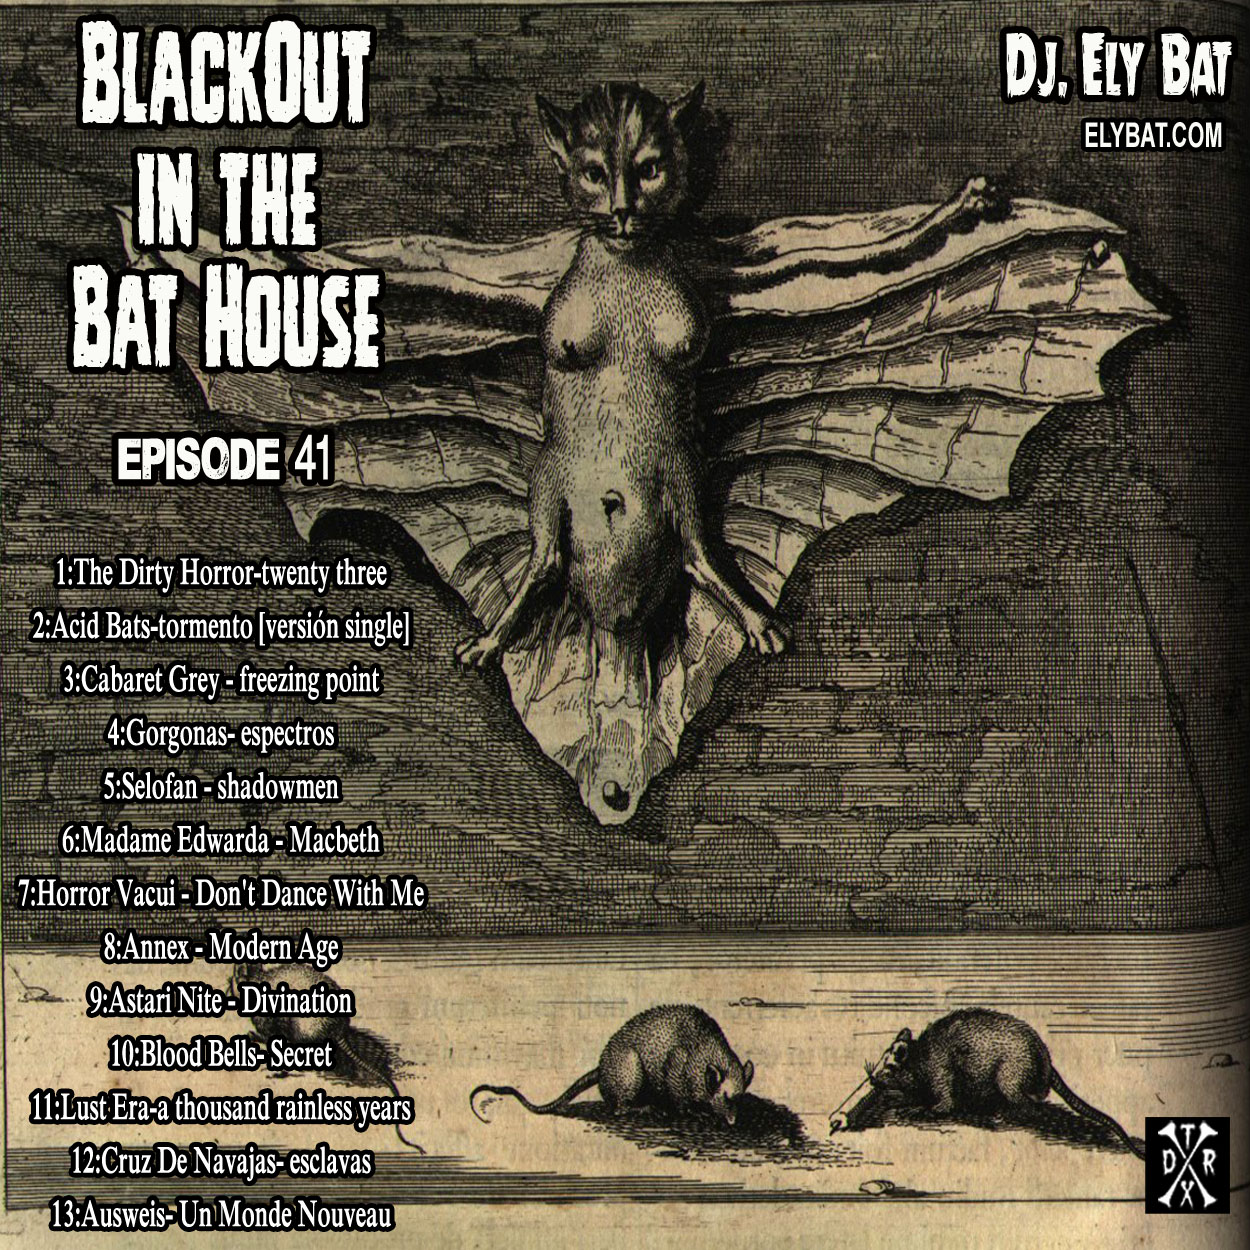 blackout in the bat house 41.jpg